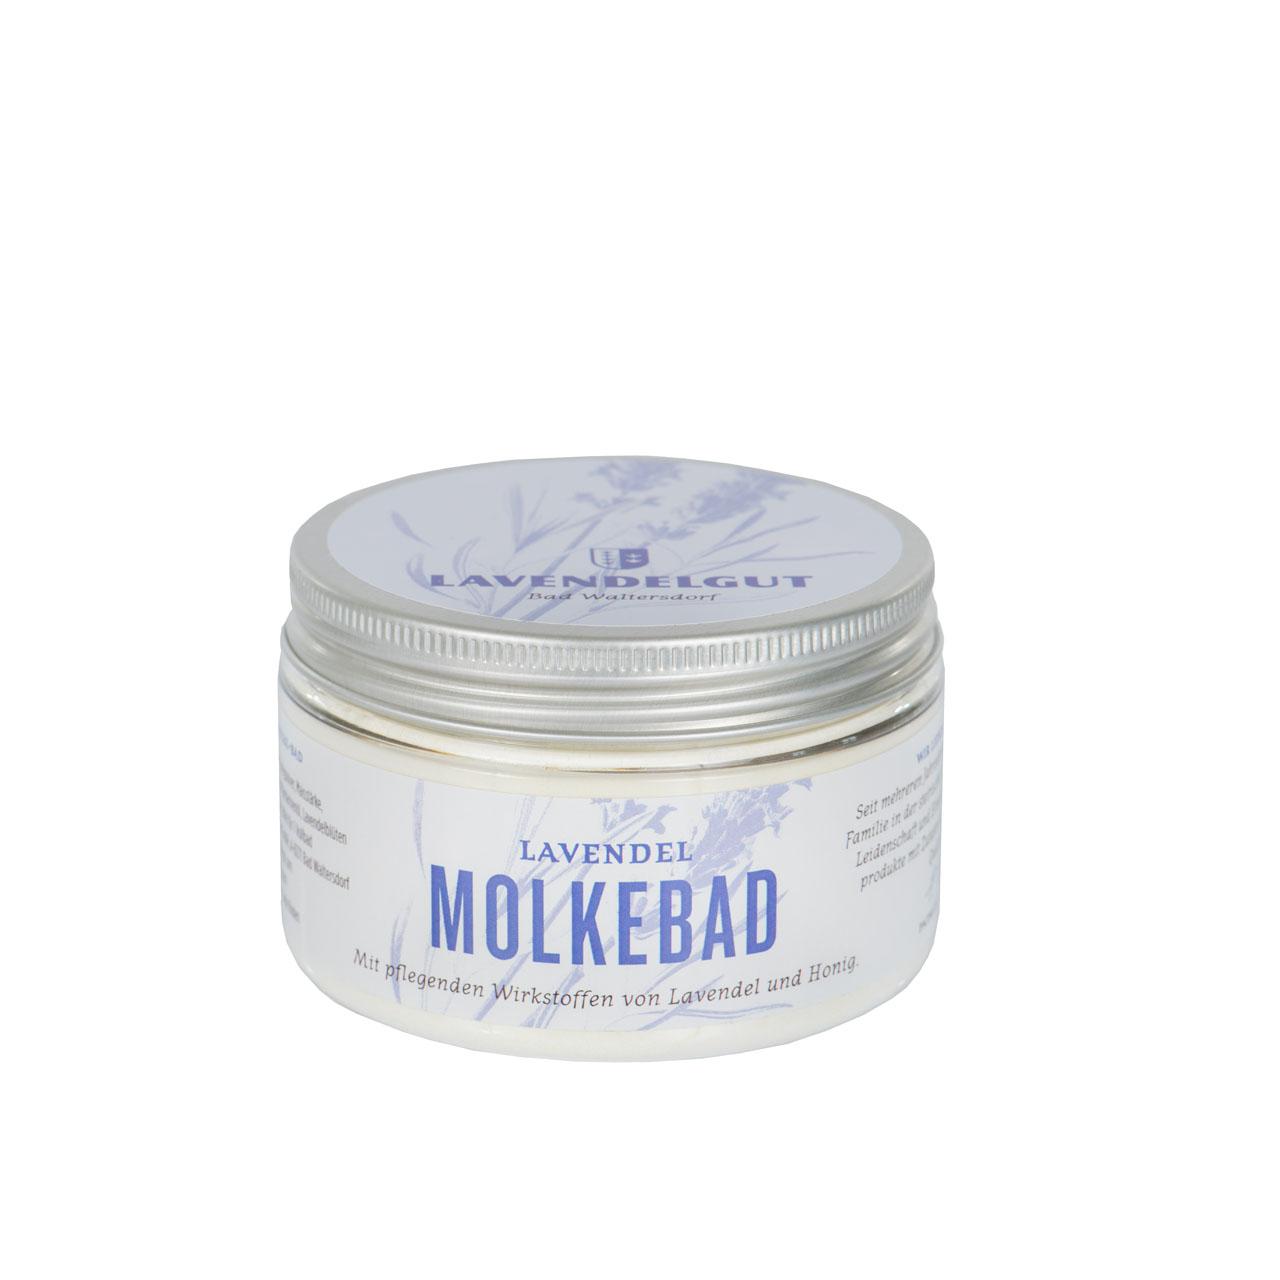 Lavendel Molkebad, 130 g